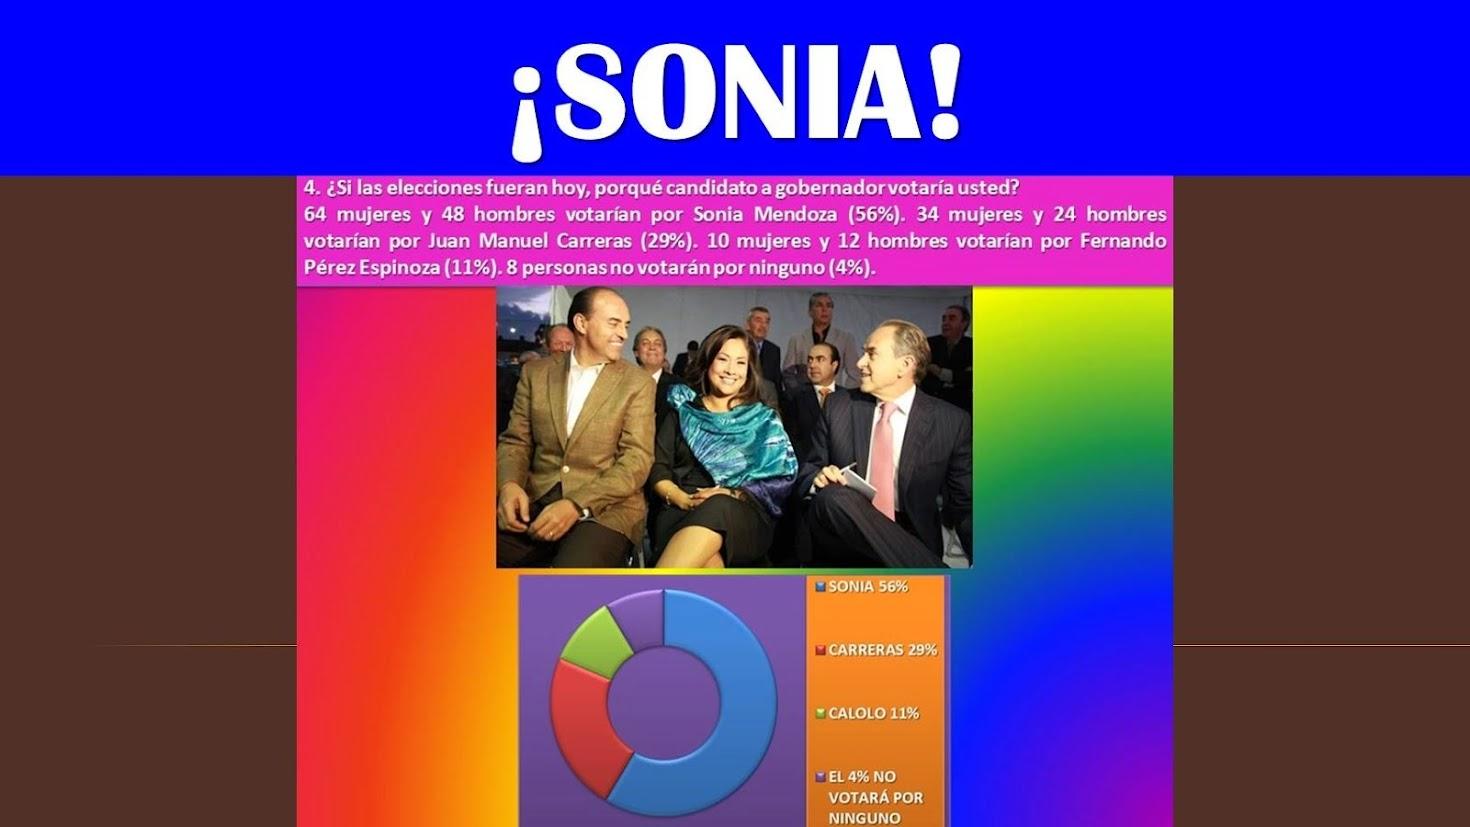 SONIA 56% CARRERAS 29%  CALOLO 11%